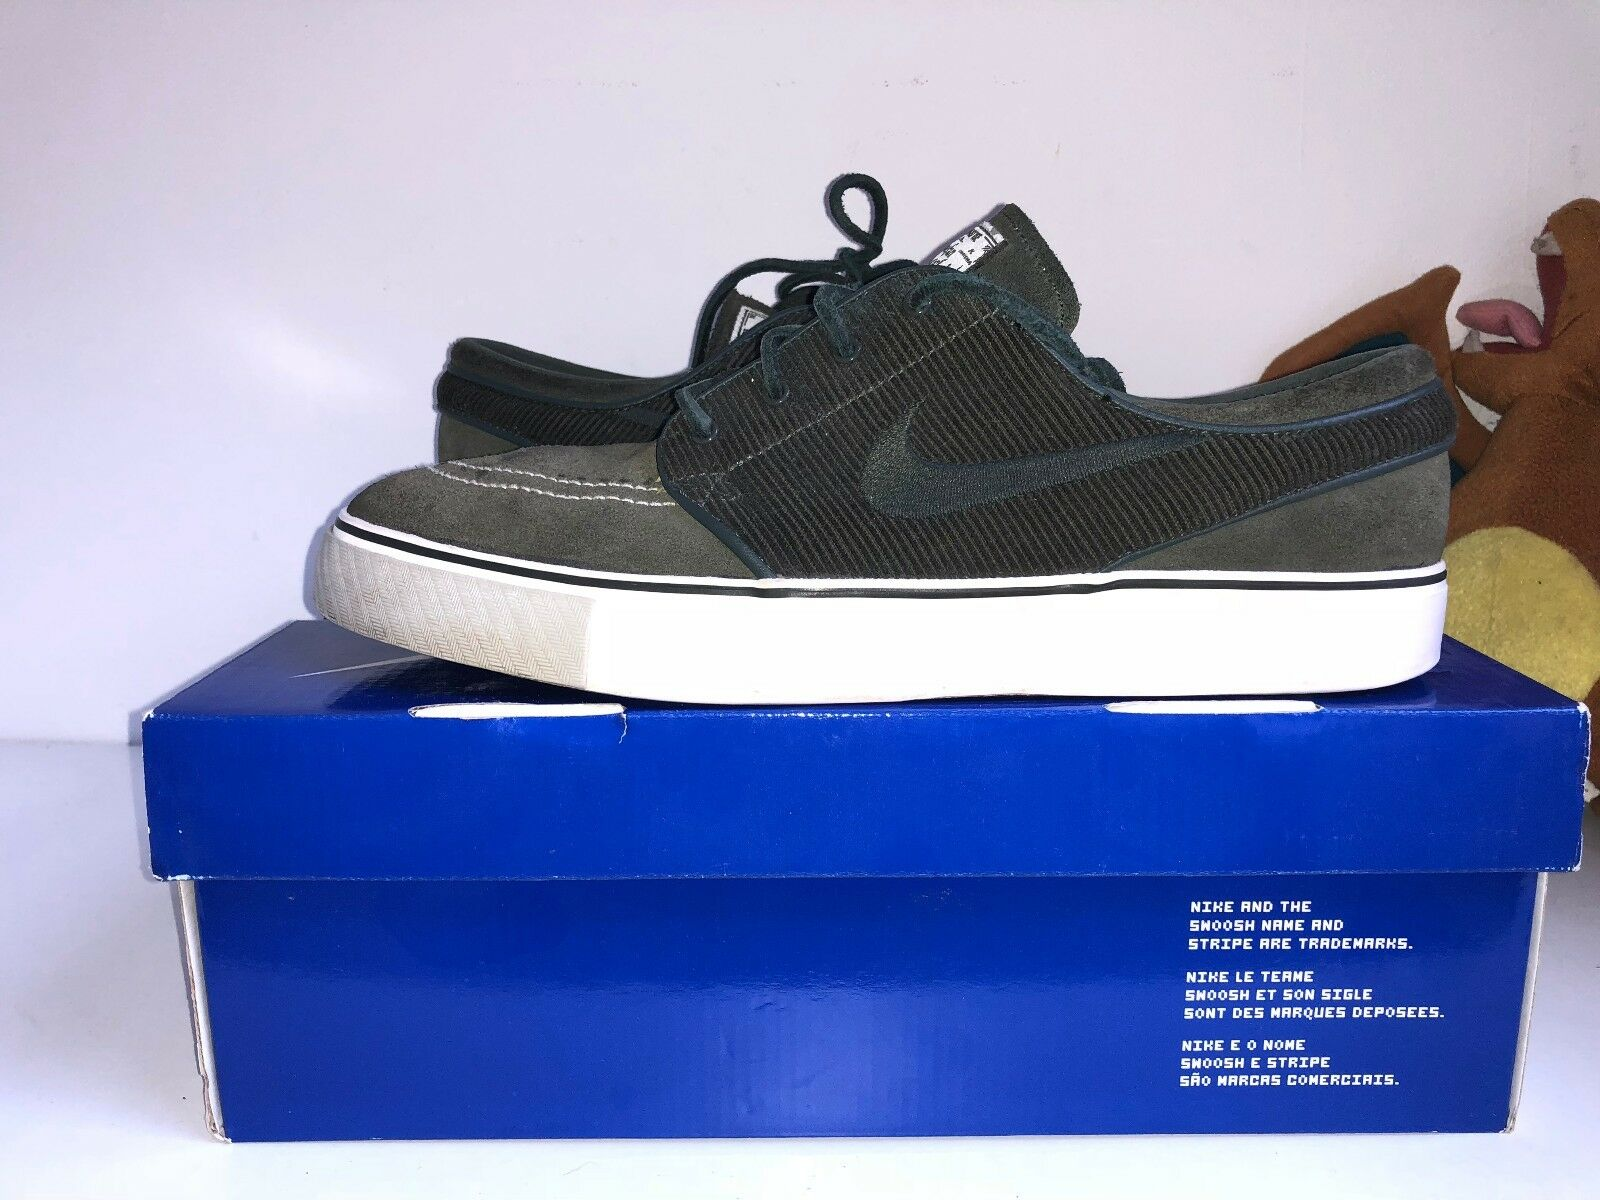 Scarpe da ginnastica Nike Stefan 10-] Janoski-militare scuro/militare scuro [Us 10-] Stefan 124903